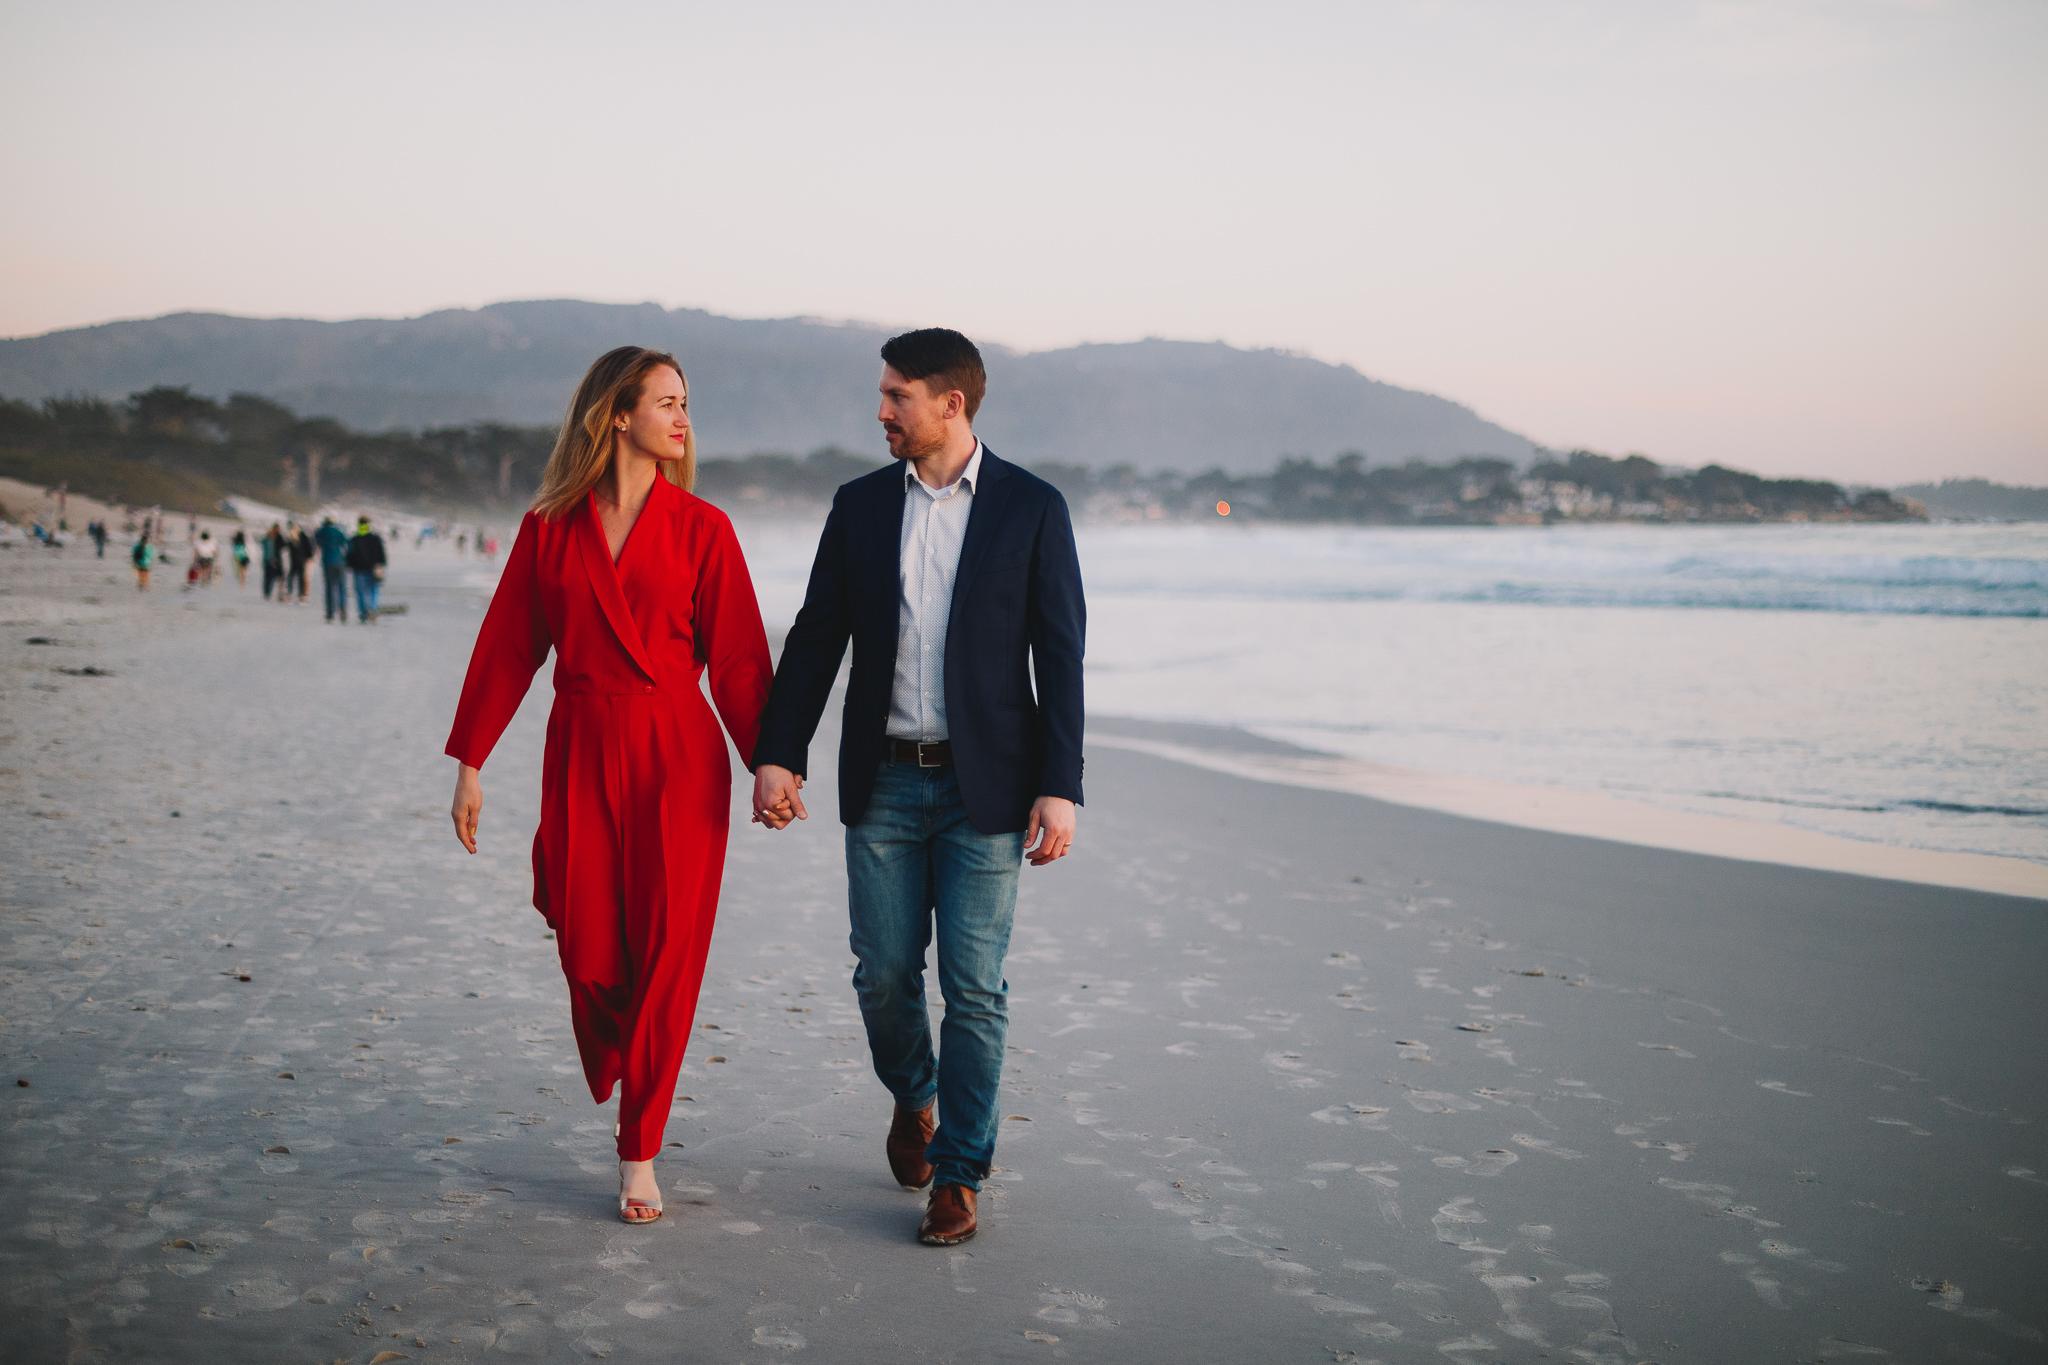 Archer Inspired Photography Carmel Beach California Wedding Engagement Lifestyle Anniversary Natural Light Photographer-98.jpg